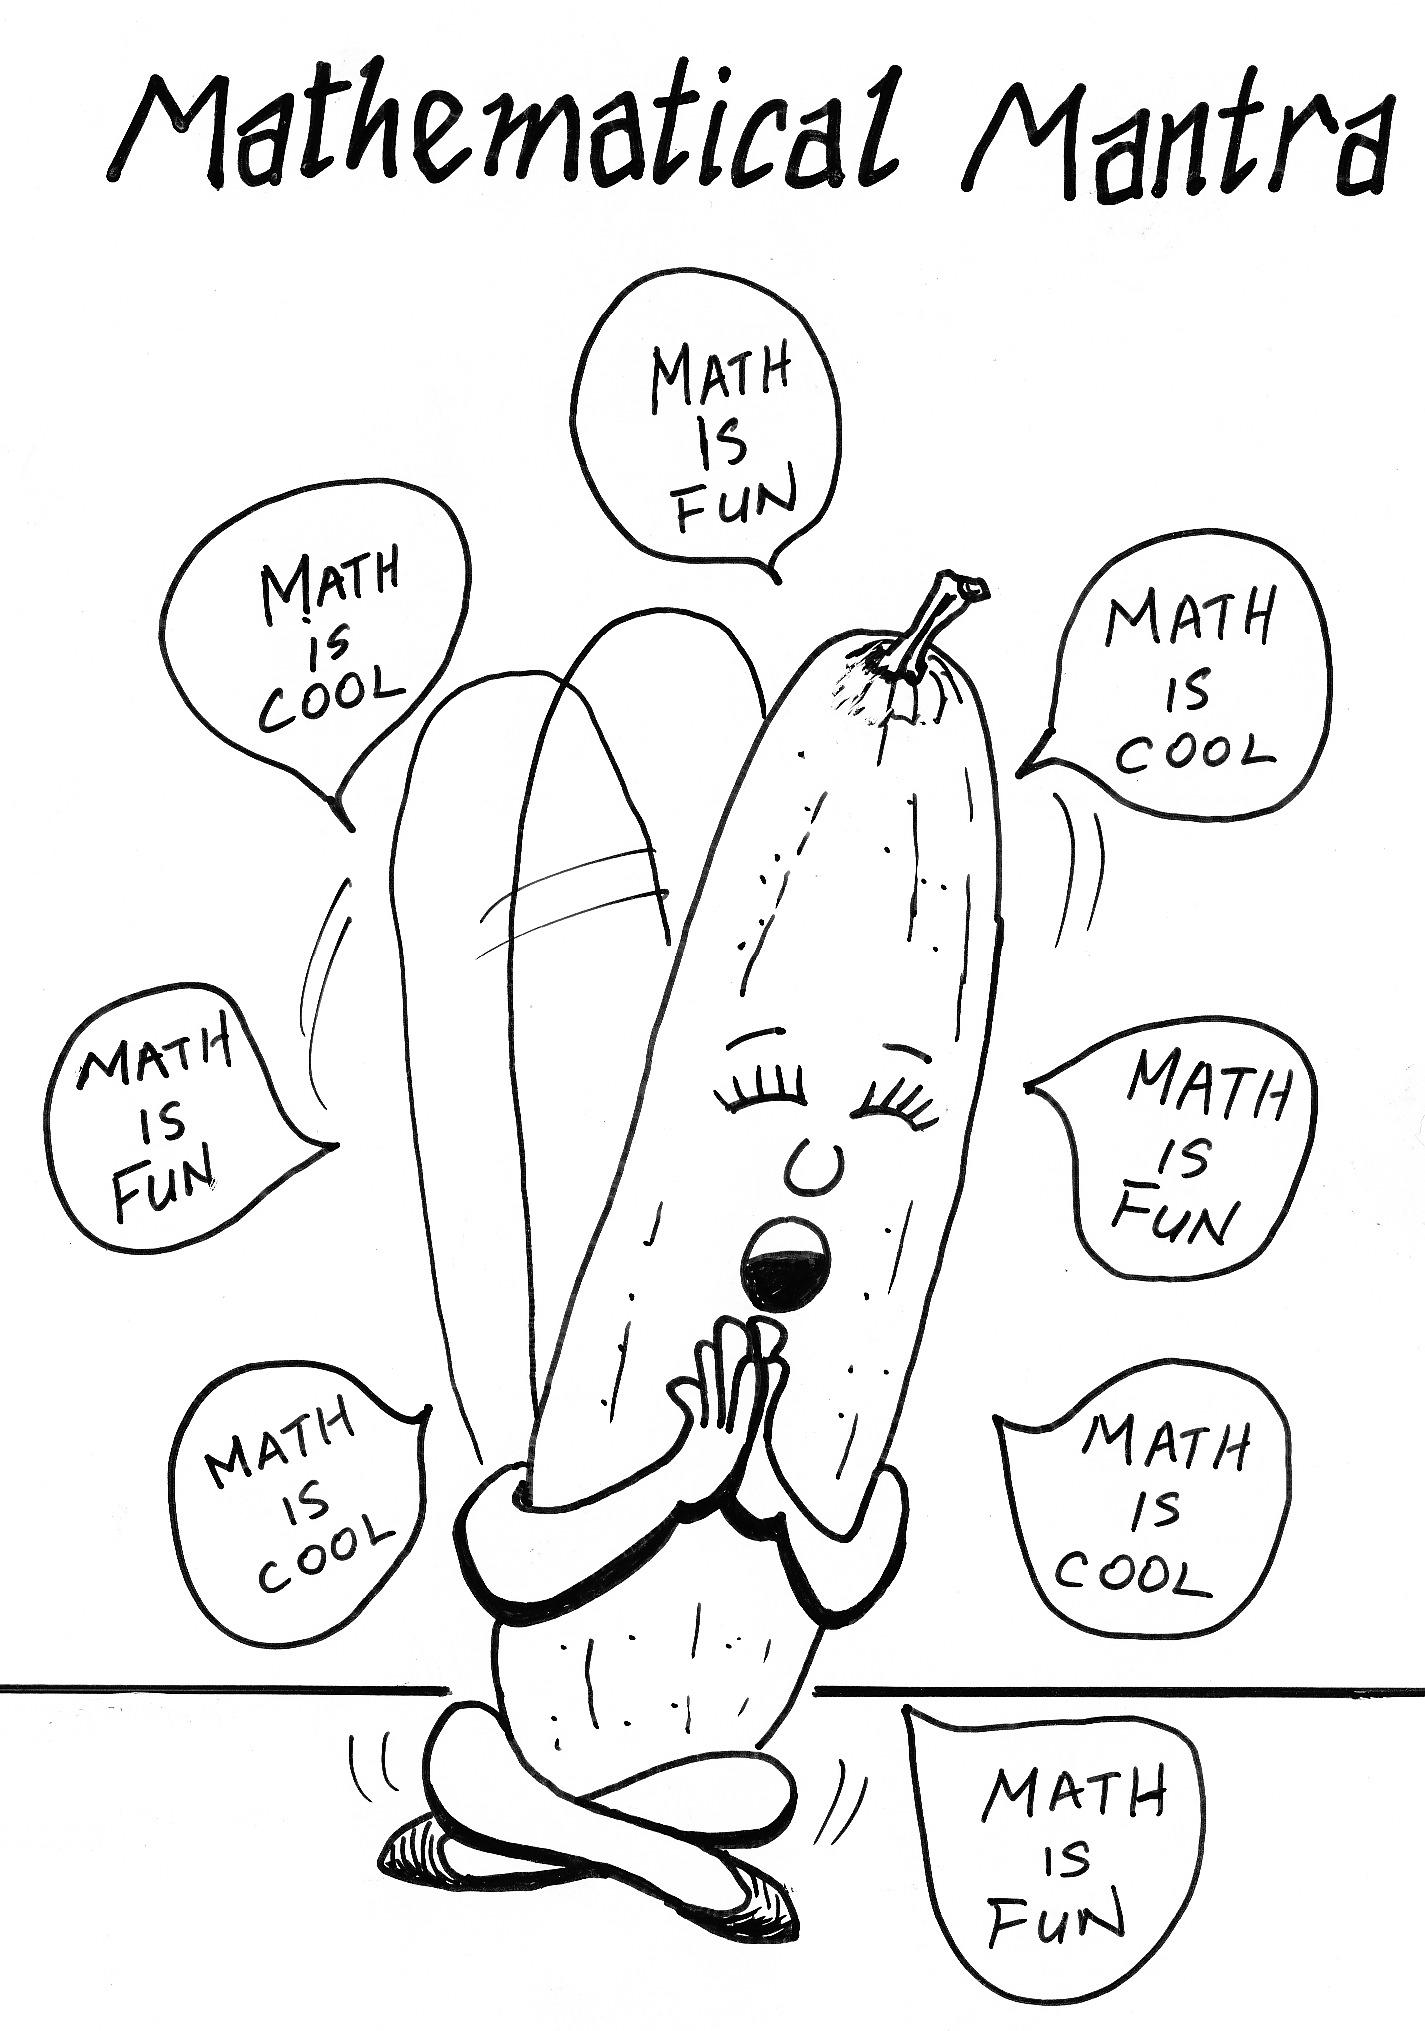 MathMantraQ16p90